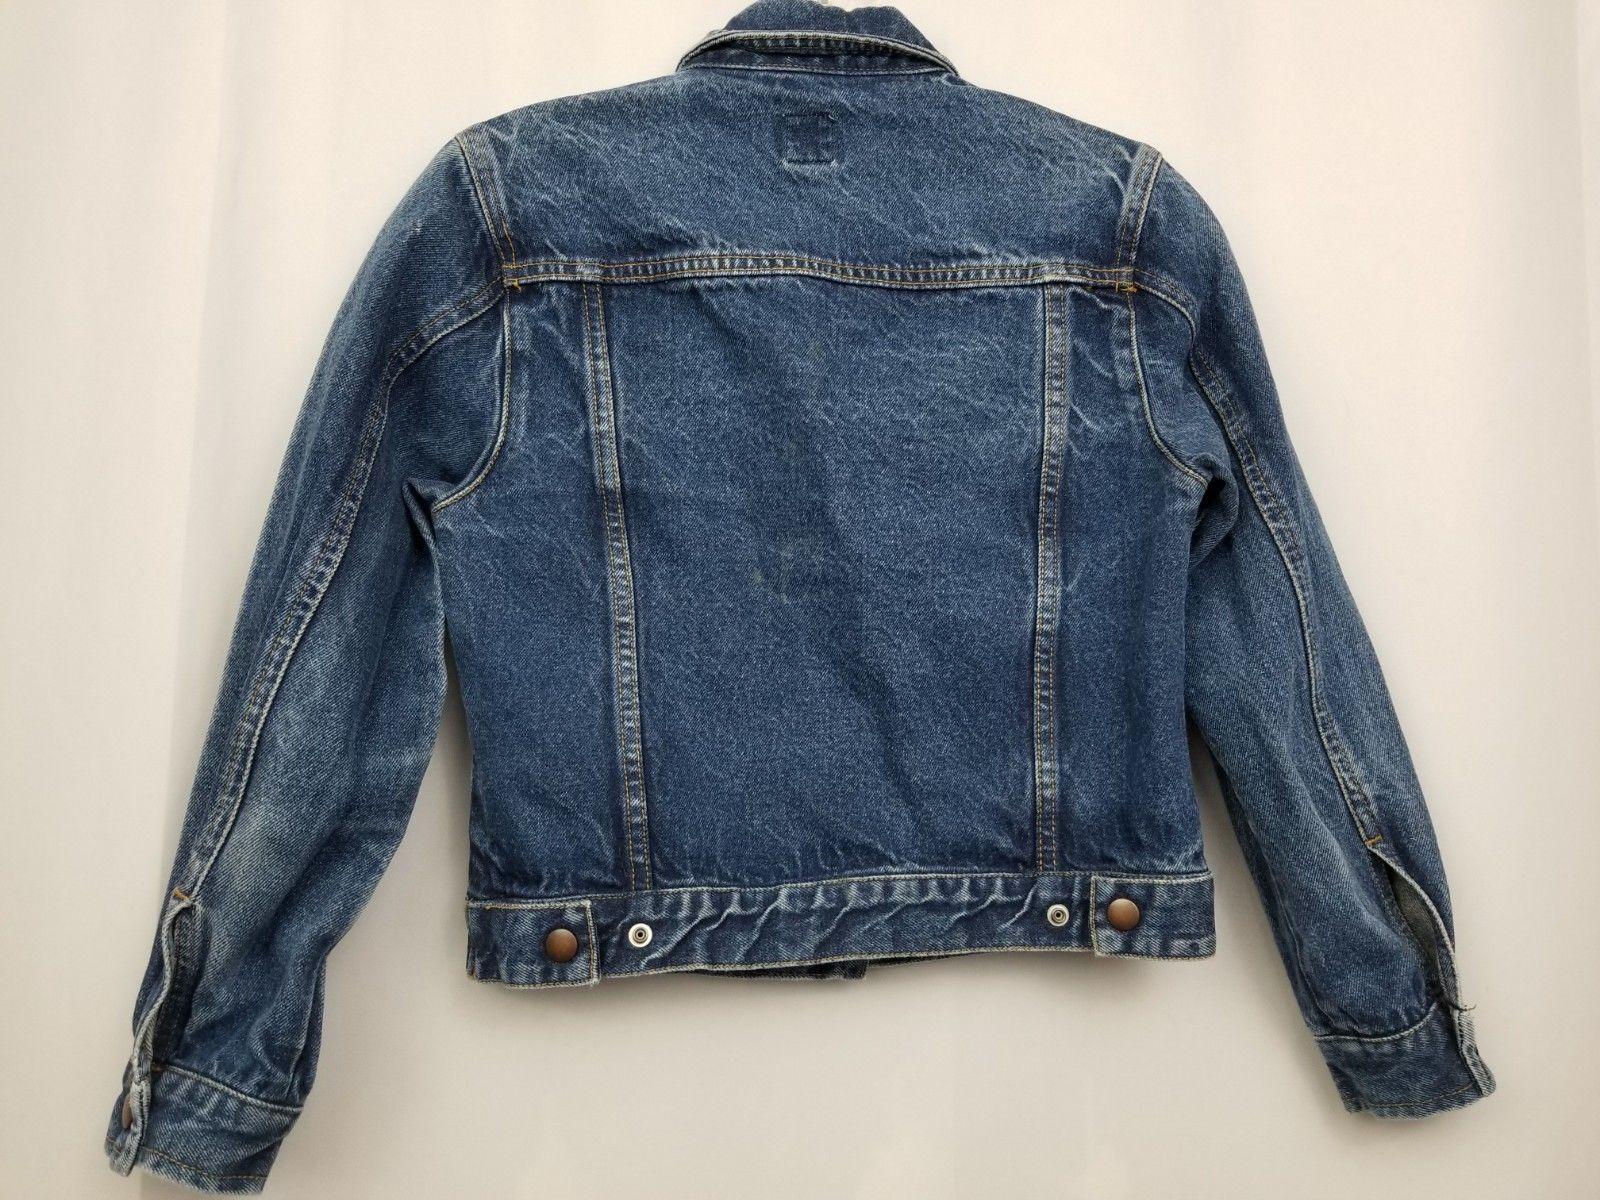 GAP Kids Denim Jean Jacket Coat Long Sleeve Blue Pockets Large Factory Store image 6